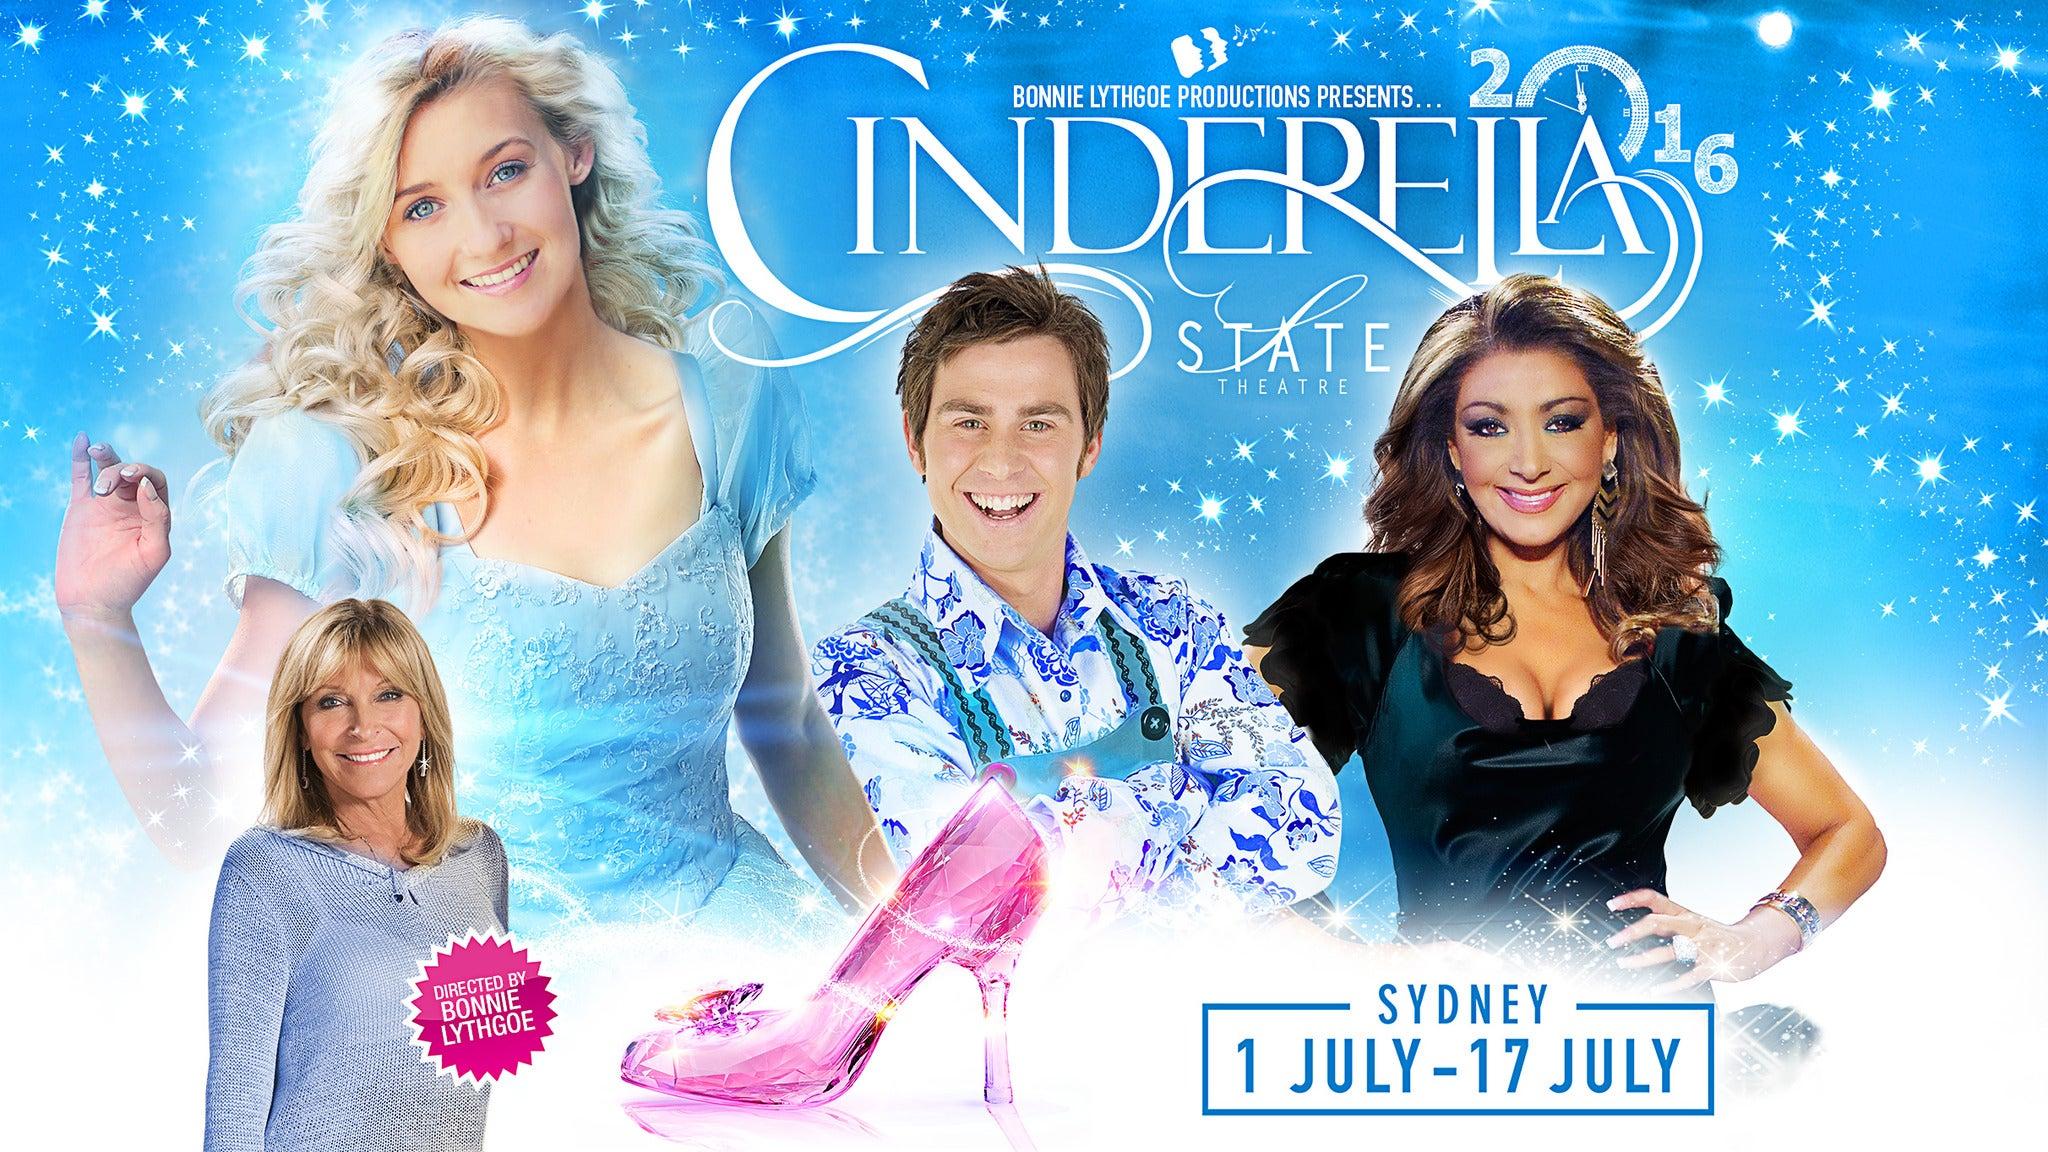 Cinderella at Birmingham Children's Theatre at the BJCC